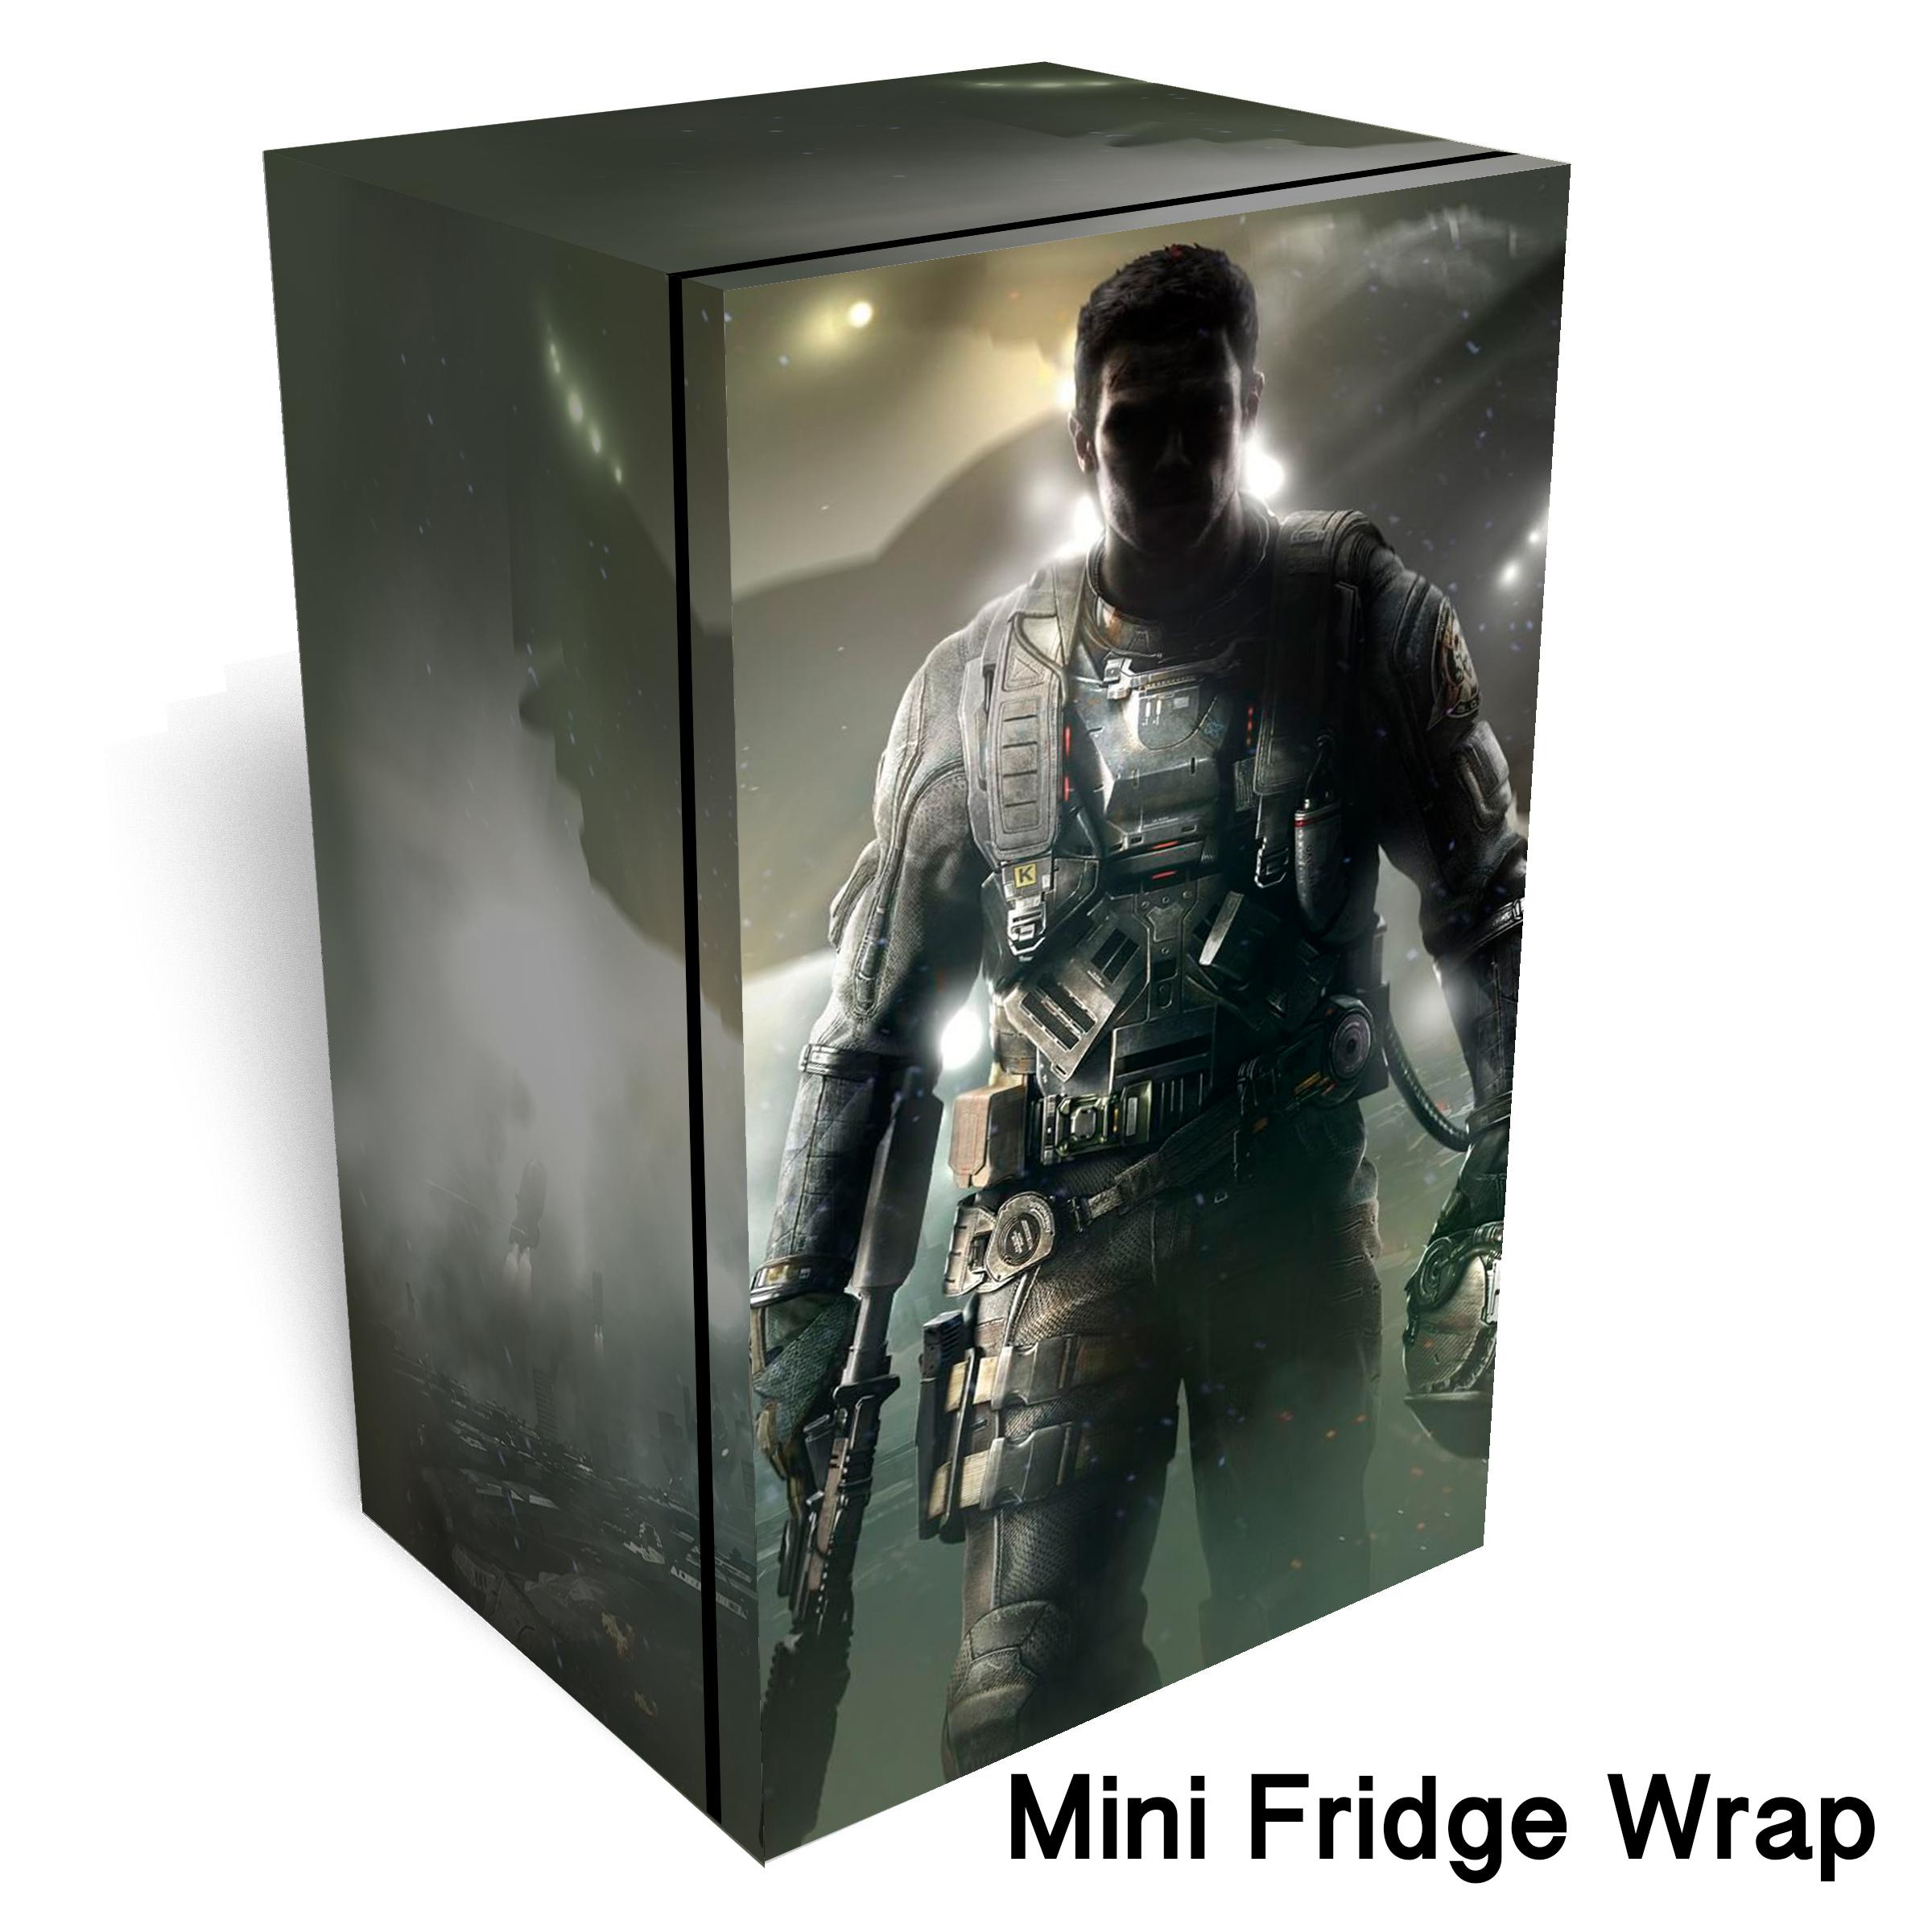 Call Of Duty Infinite Warfare Mini Fridge Wrap 1